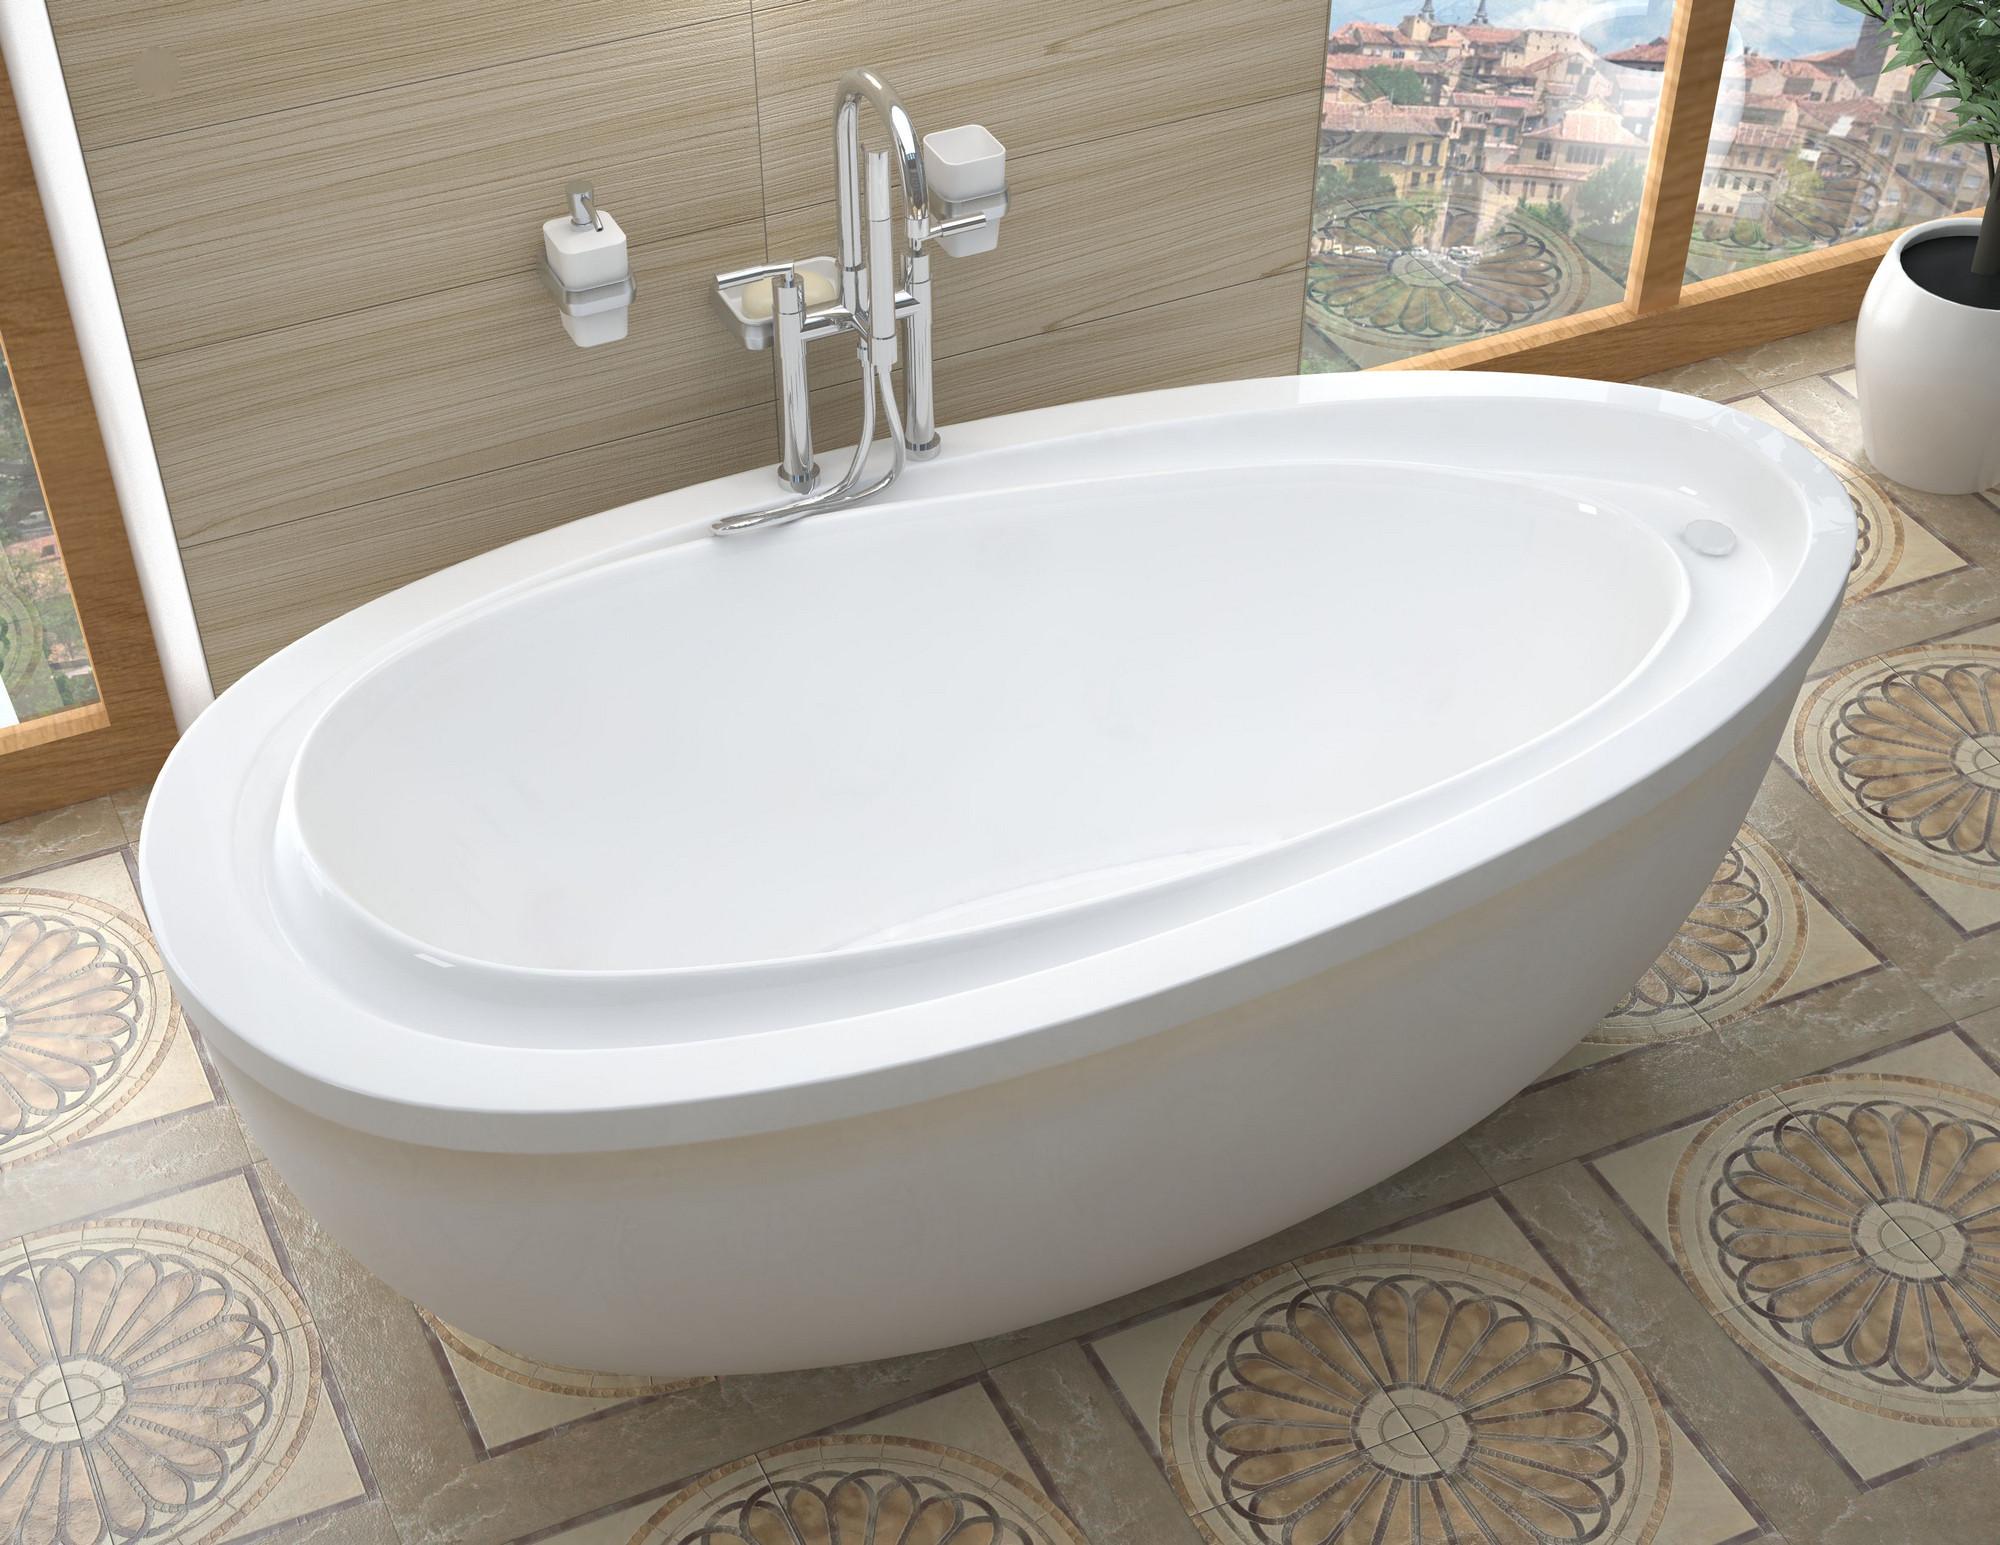 MediTub 3871BS Atlantis Breeze 38 x 71 Oval Freestanding Soaker Bathtub